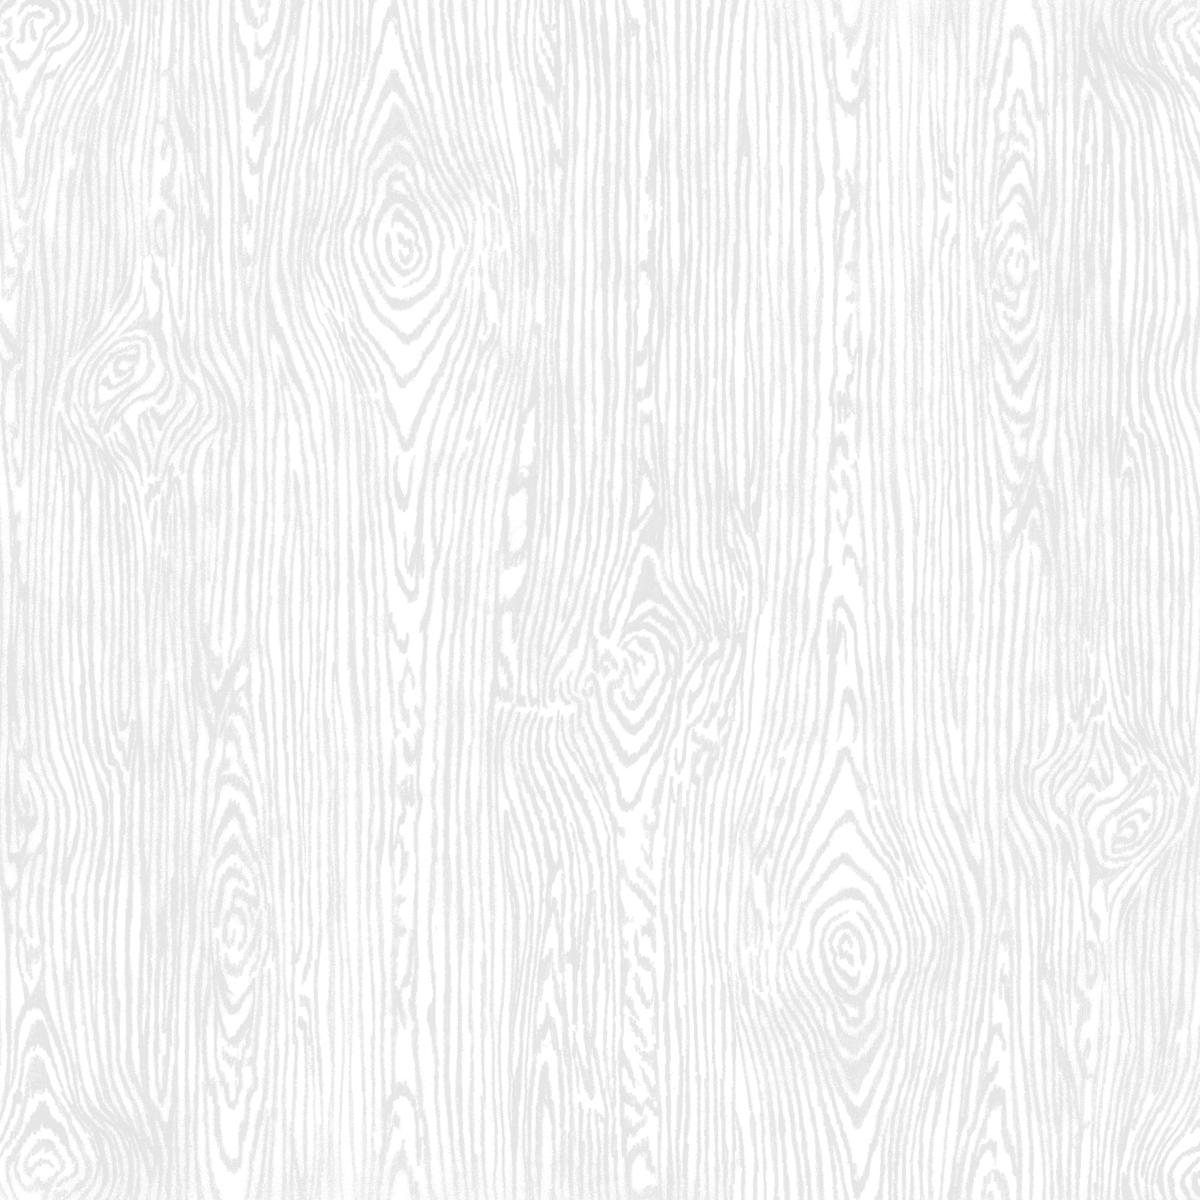 American Crafts Textured Cardstock 12X12-White Woodgrain